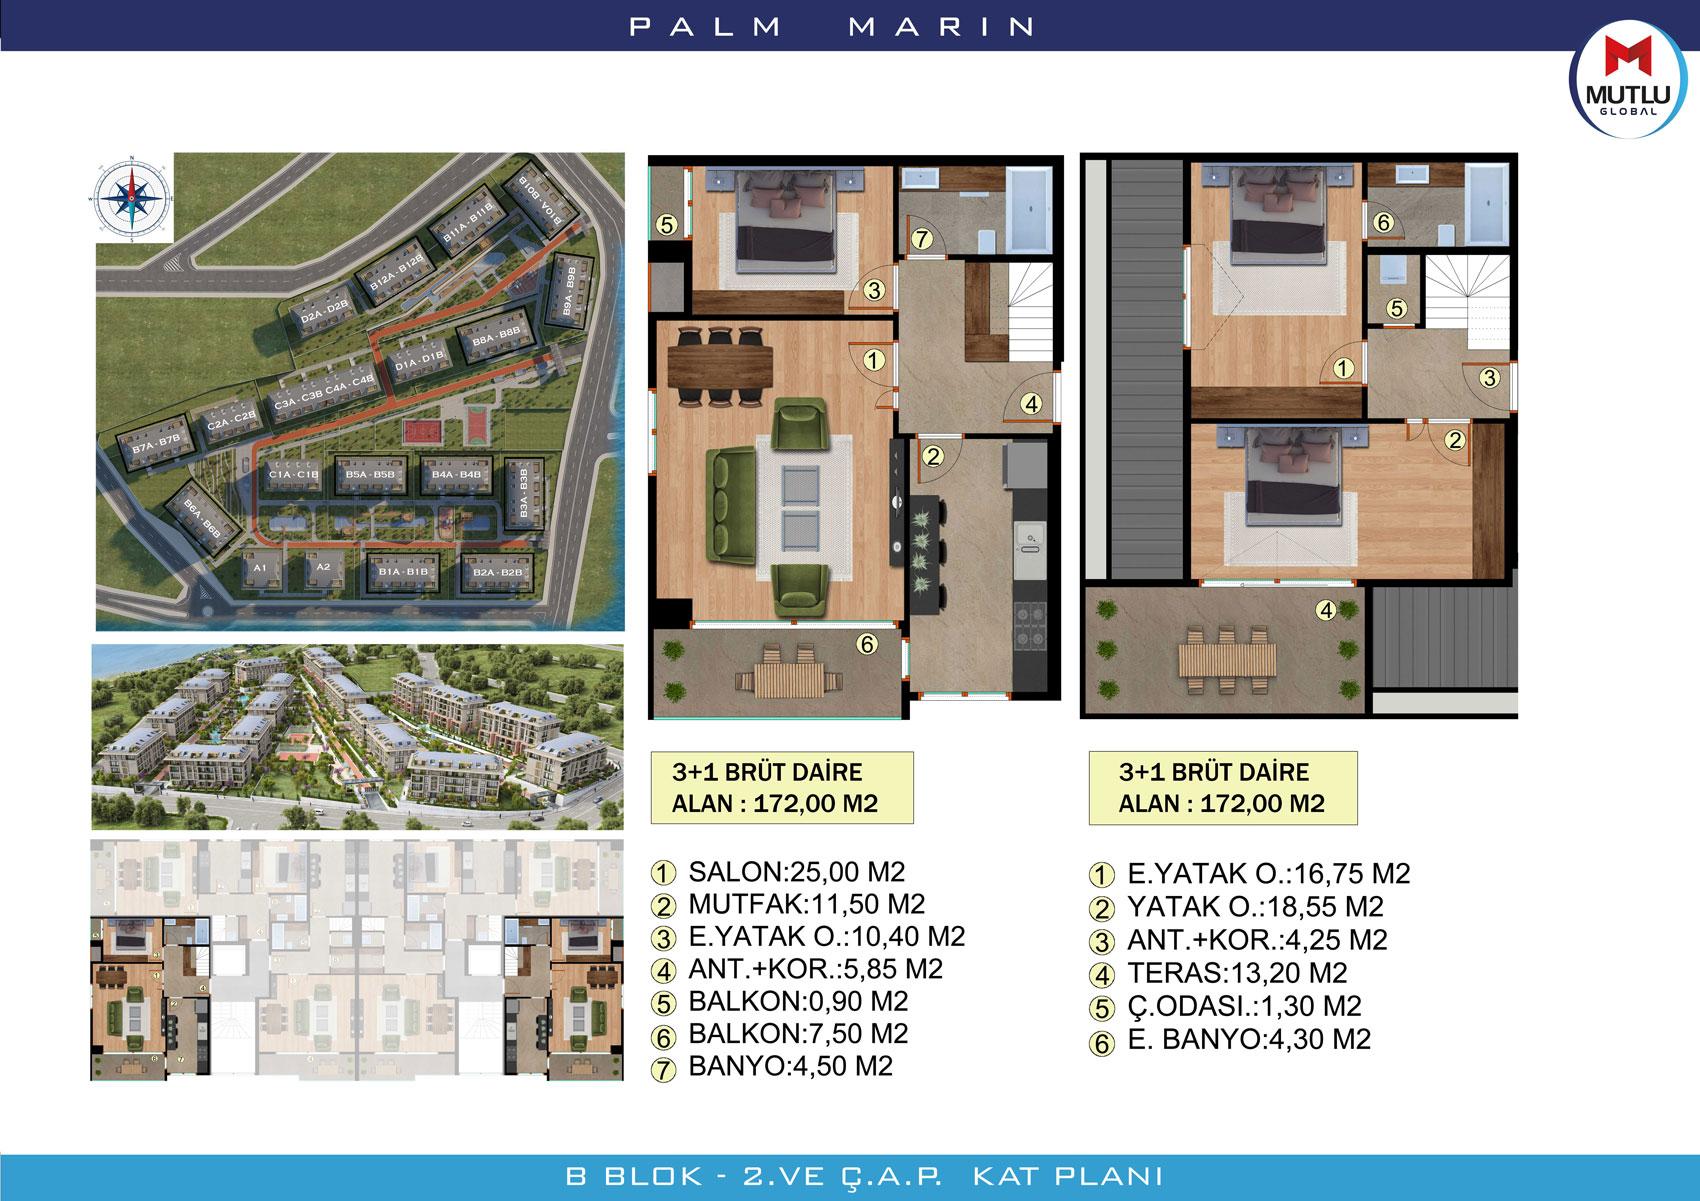 Palm Marin Beylikdüzü 3+1 Dubleks Kat Planları